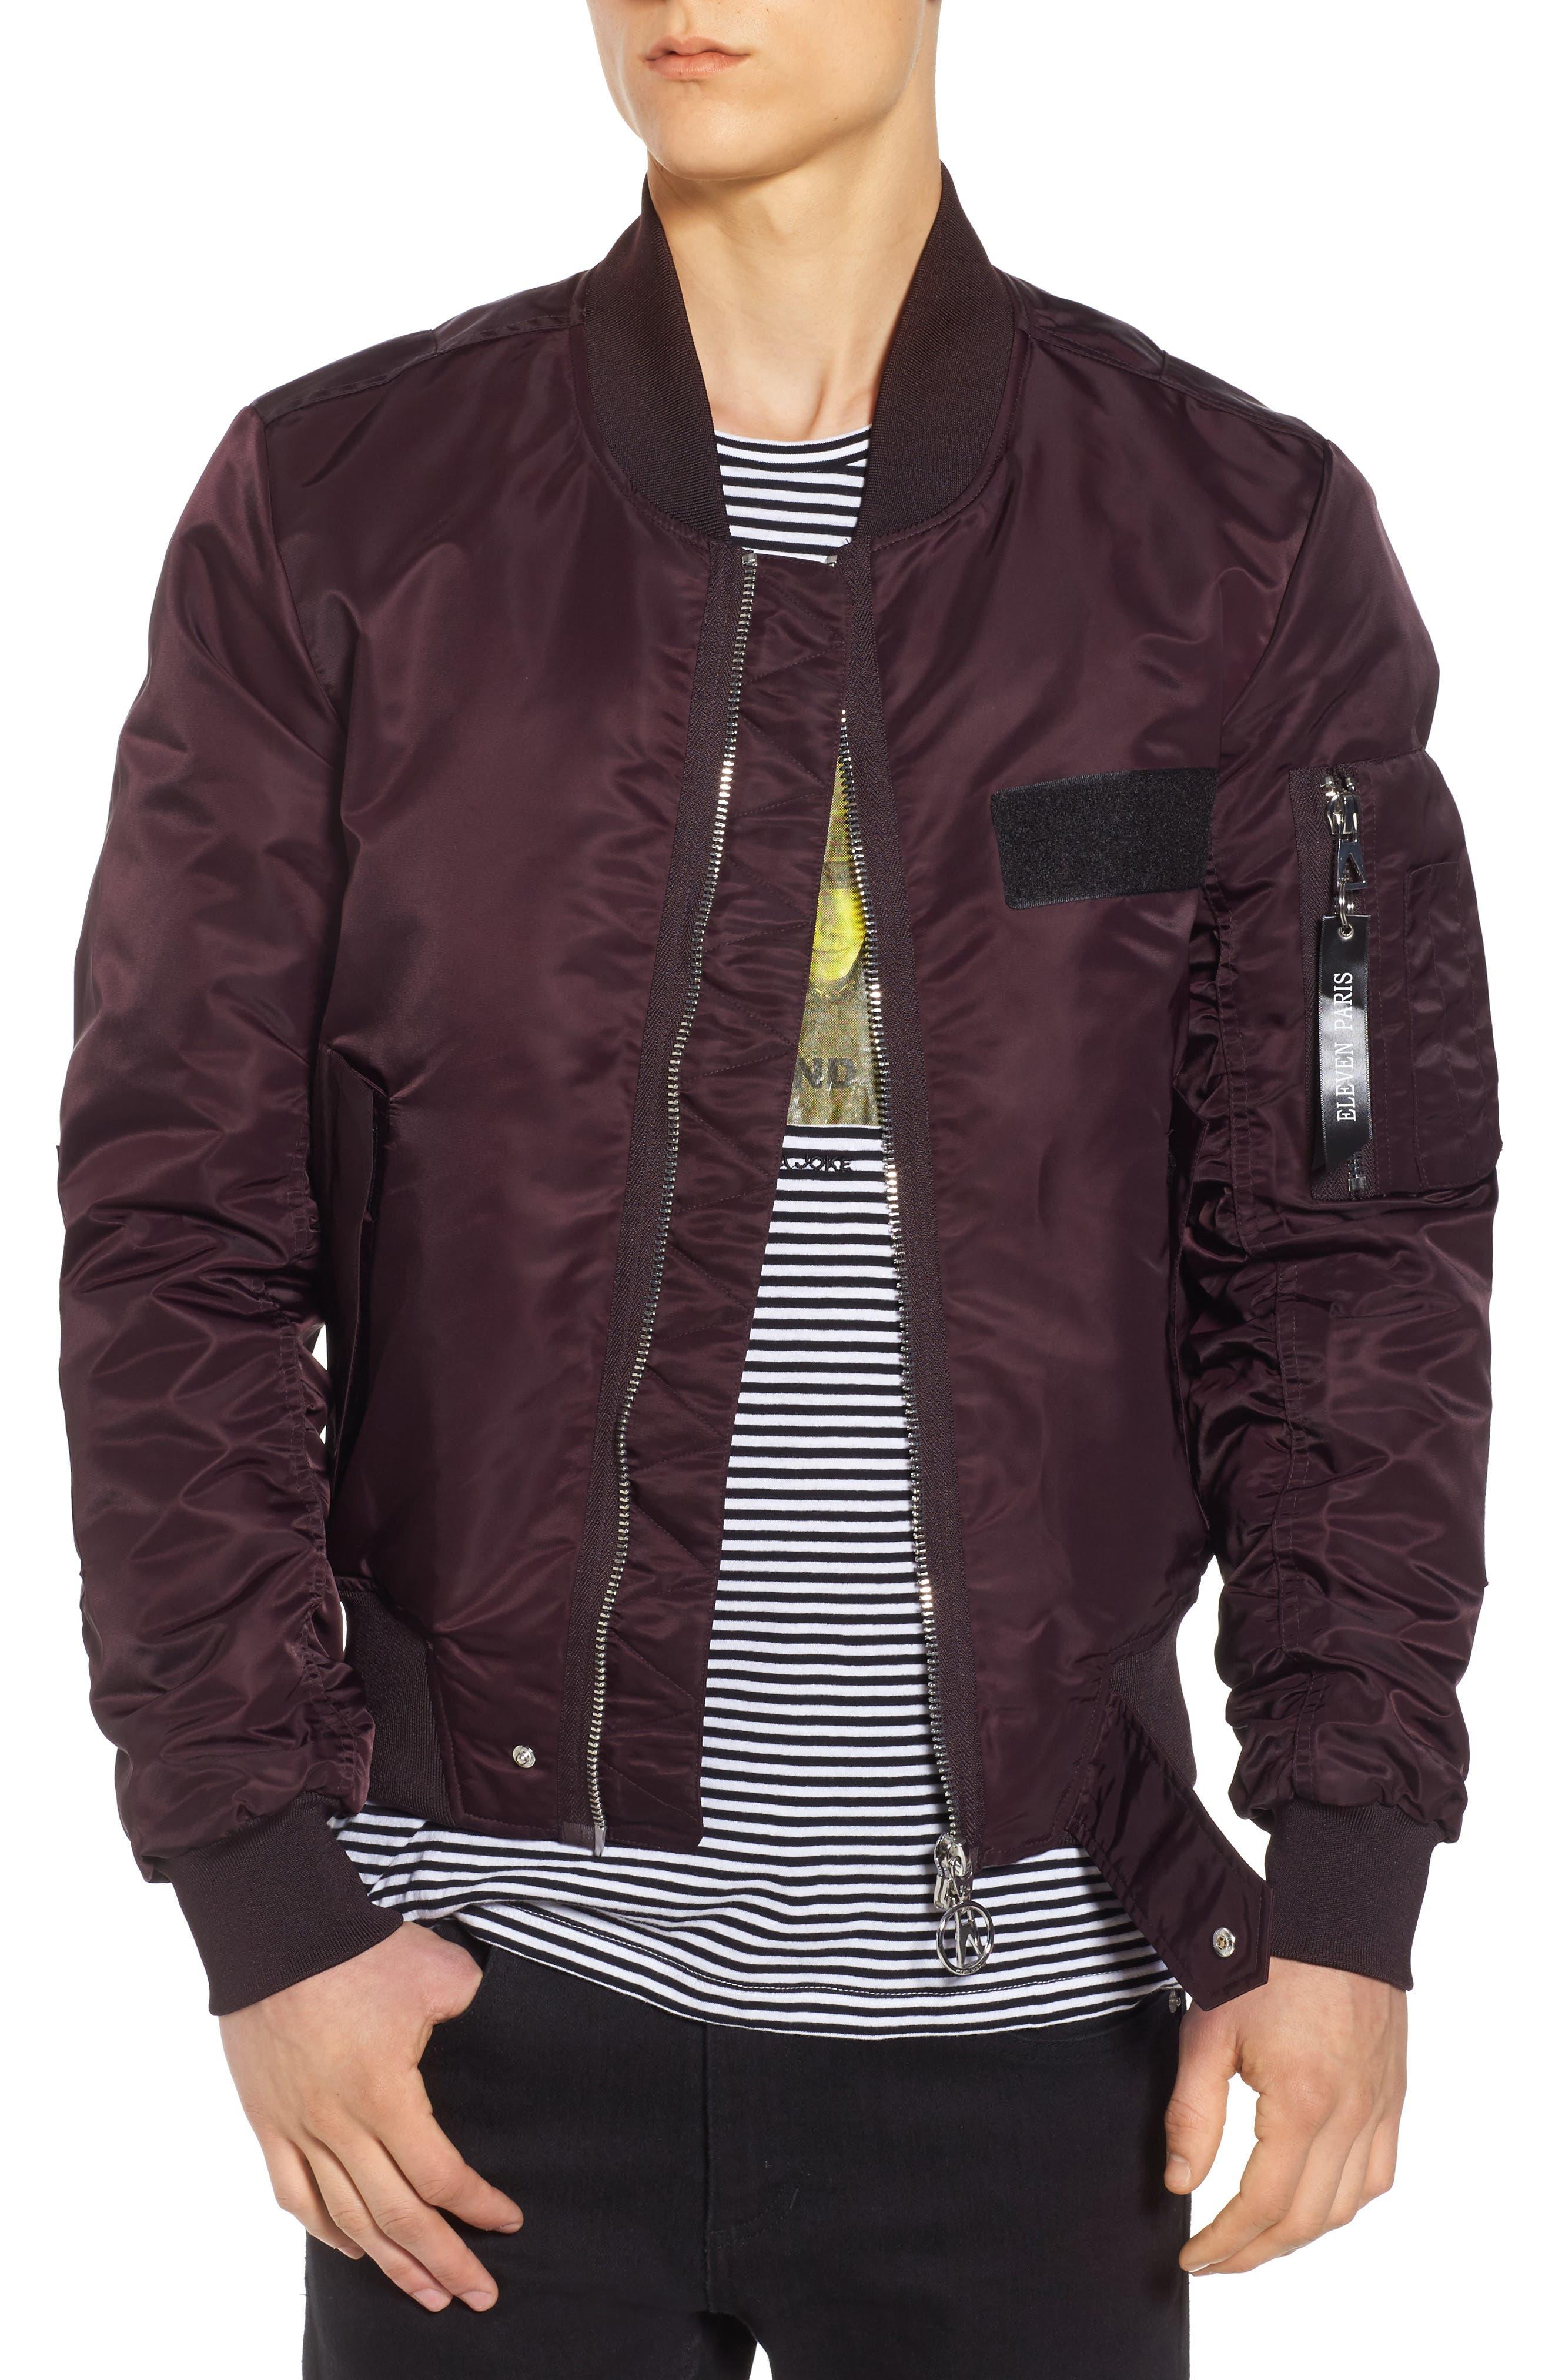 Nuxy Bomber Jacket,                         Main,                         color, 202